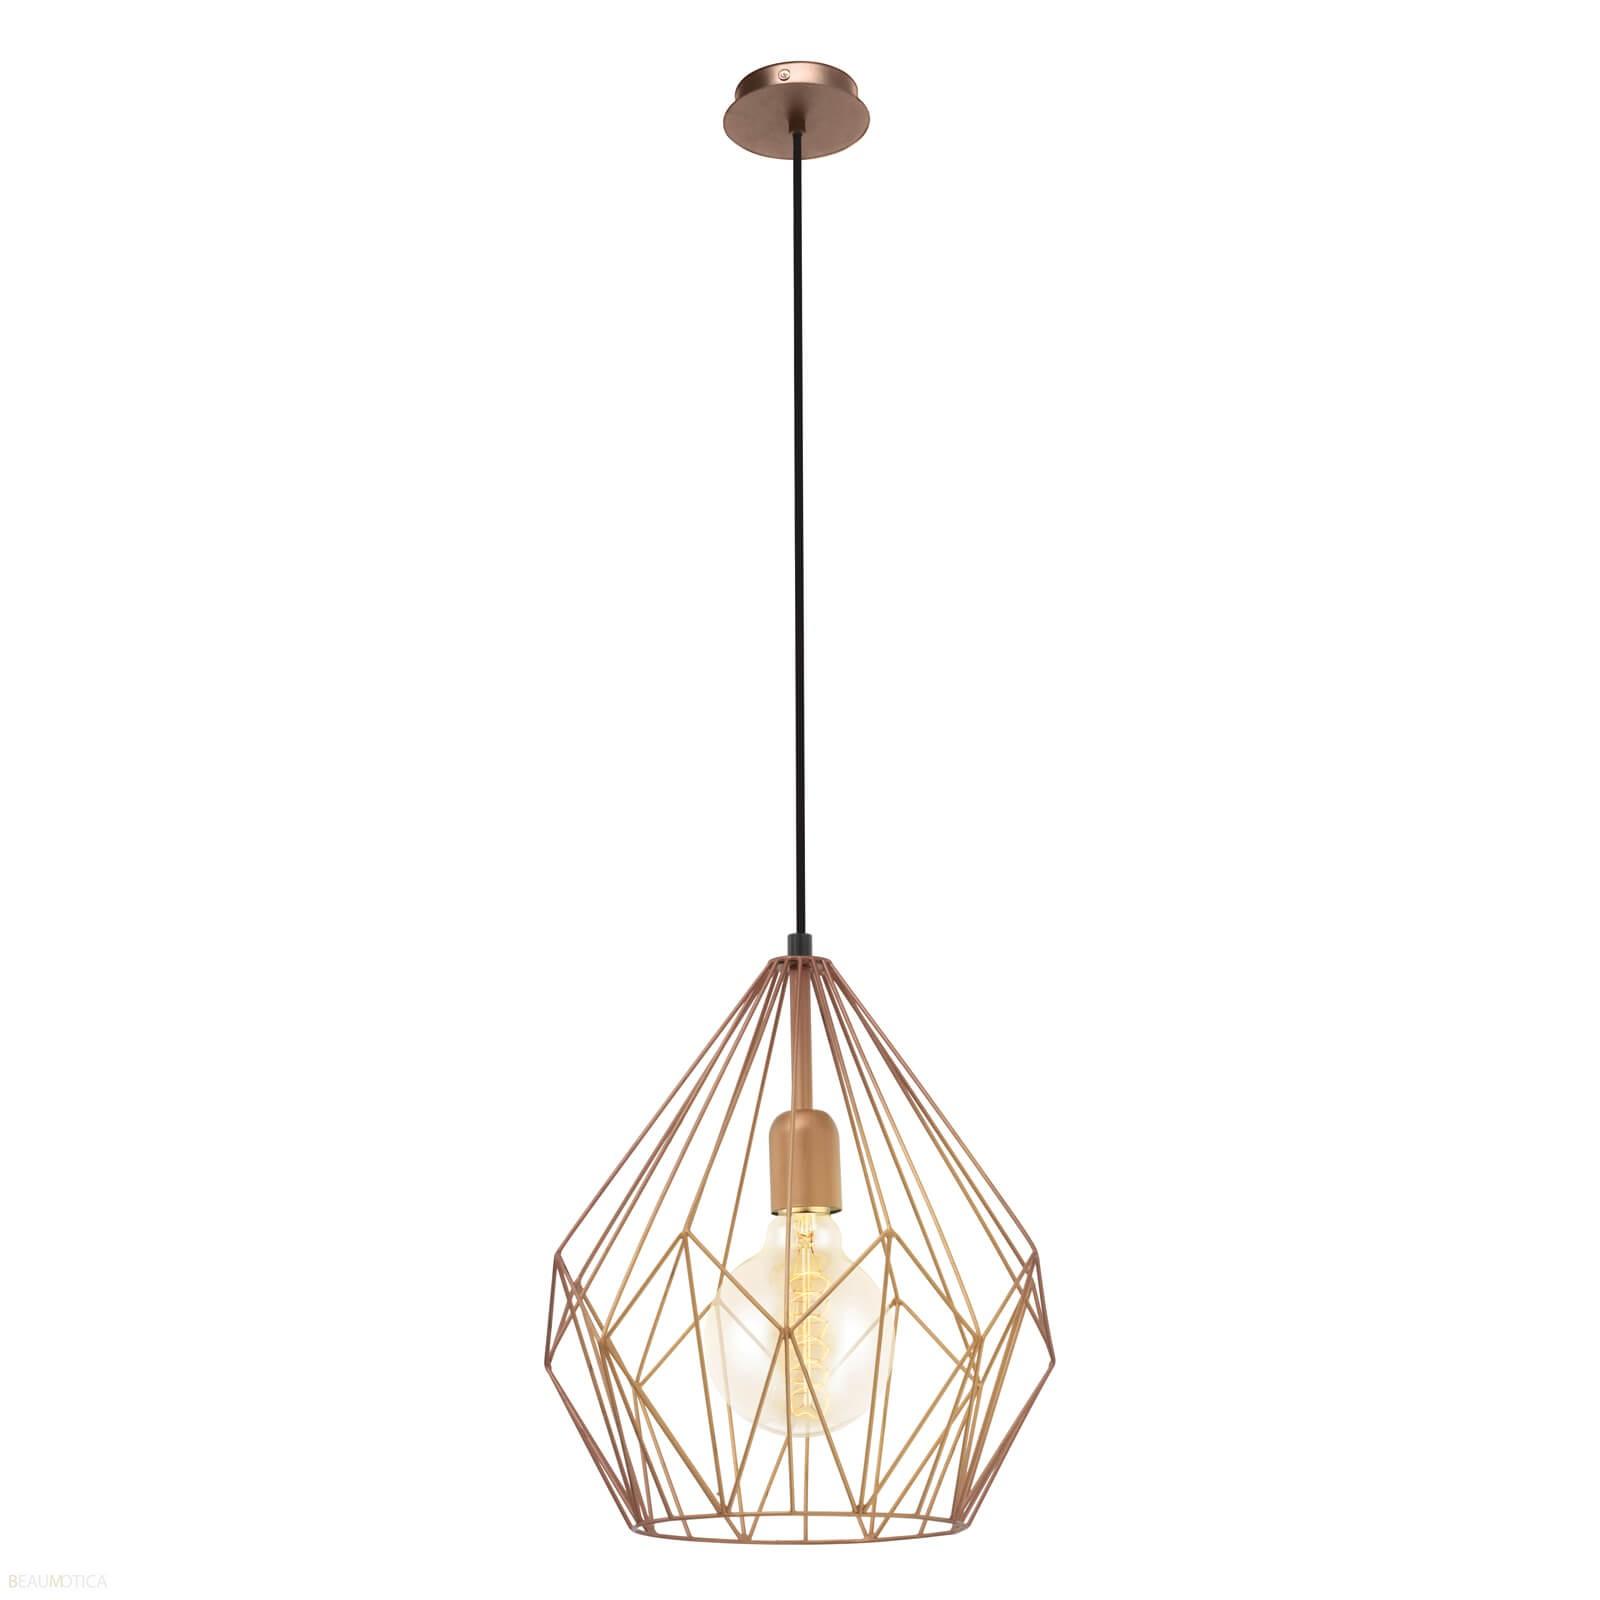 Afbeelding van Eglo Carlton Hanglamp Koperkleur (ø31cm)